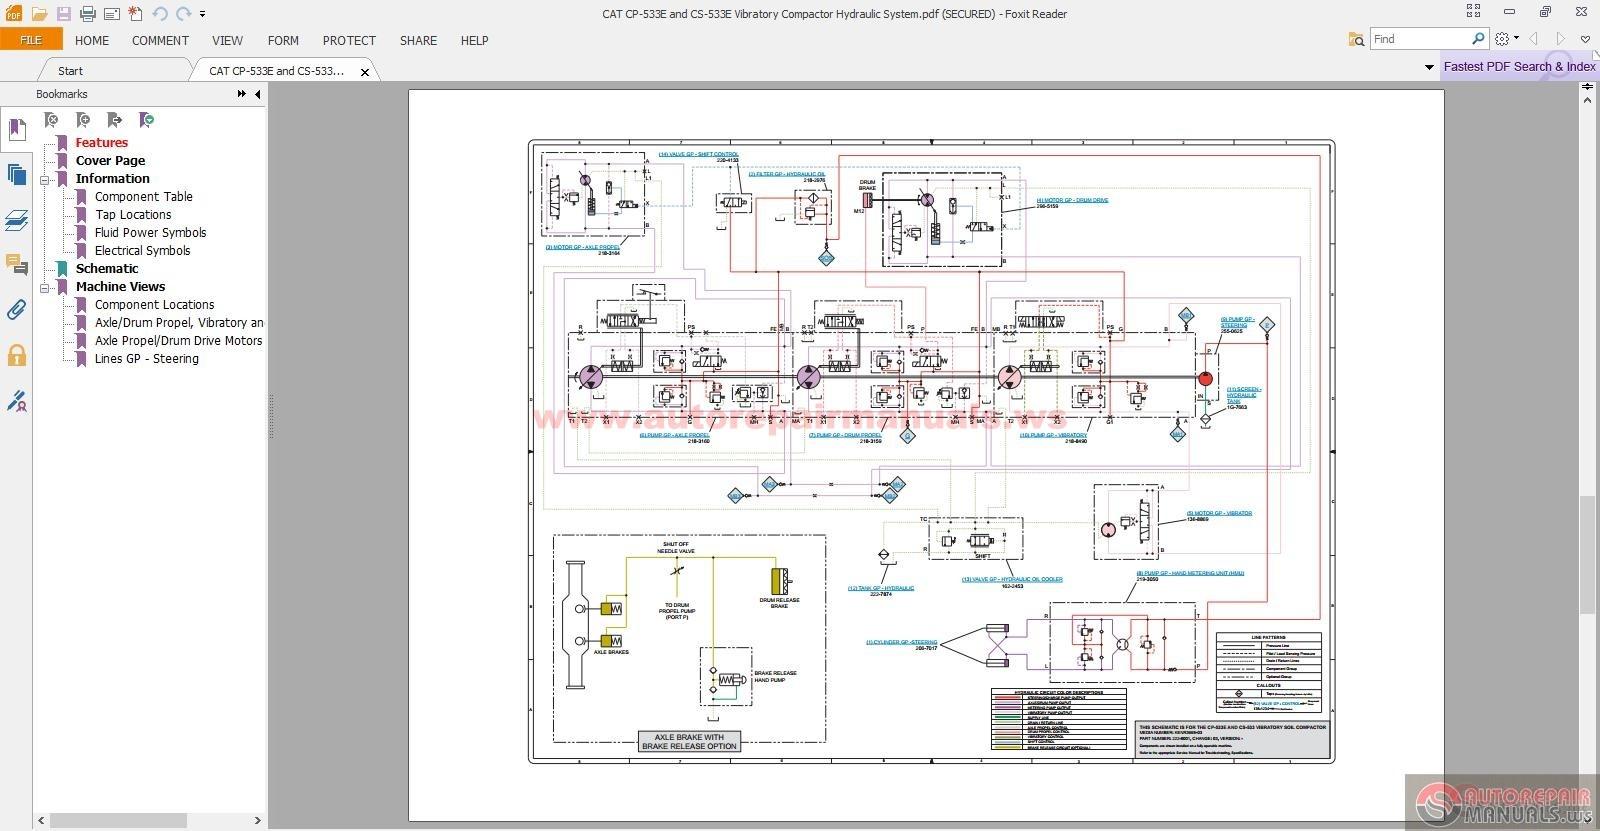 Cat 3116 Alternator Wiring Electrical Diagram 416 Backhoe Specs 3126